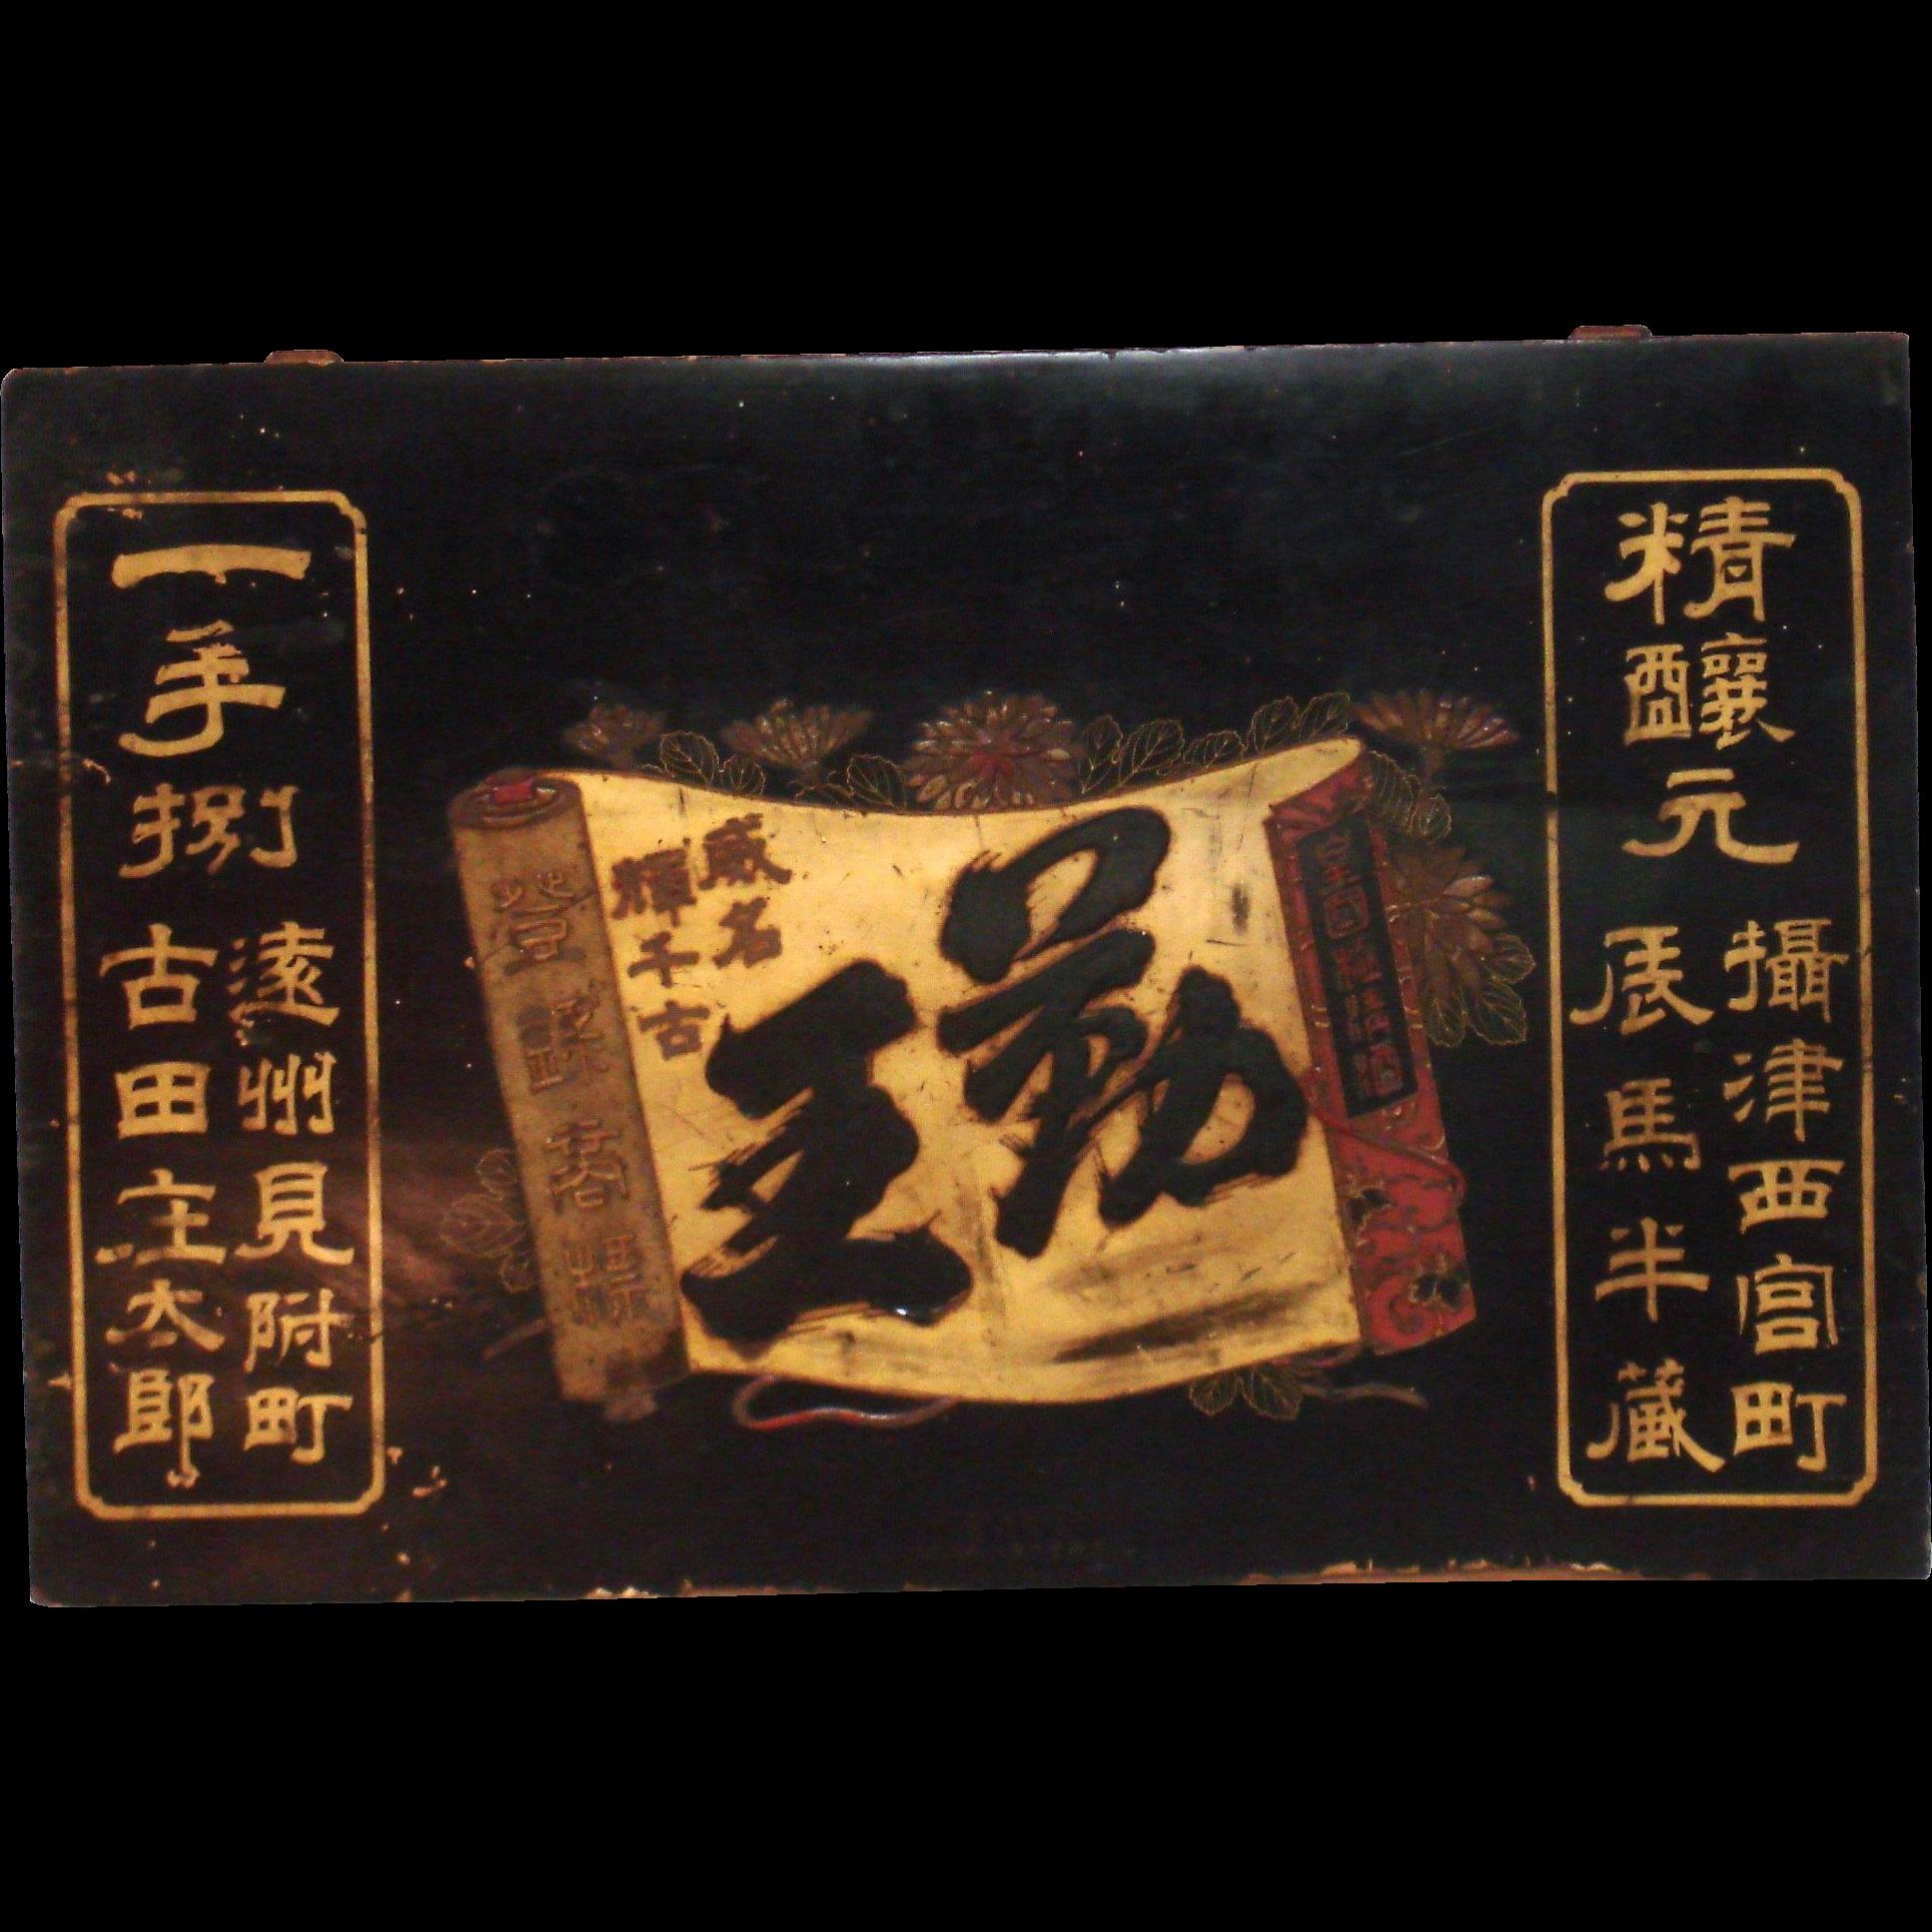 Japanese Trade Sign For Chokuo Sake Trade Sign Japanese S Japanese